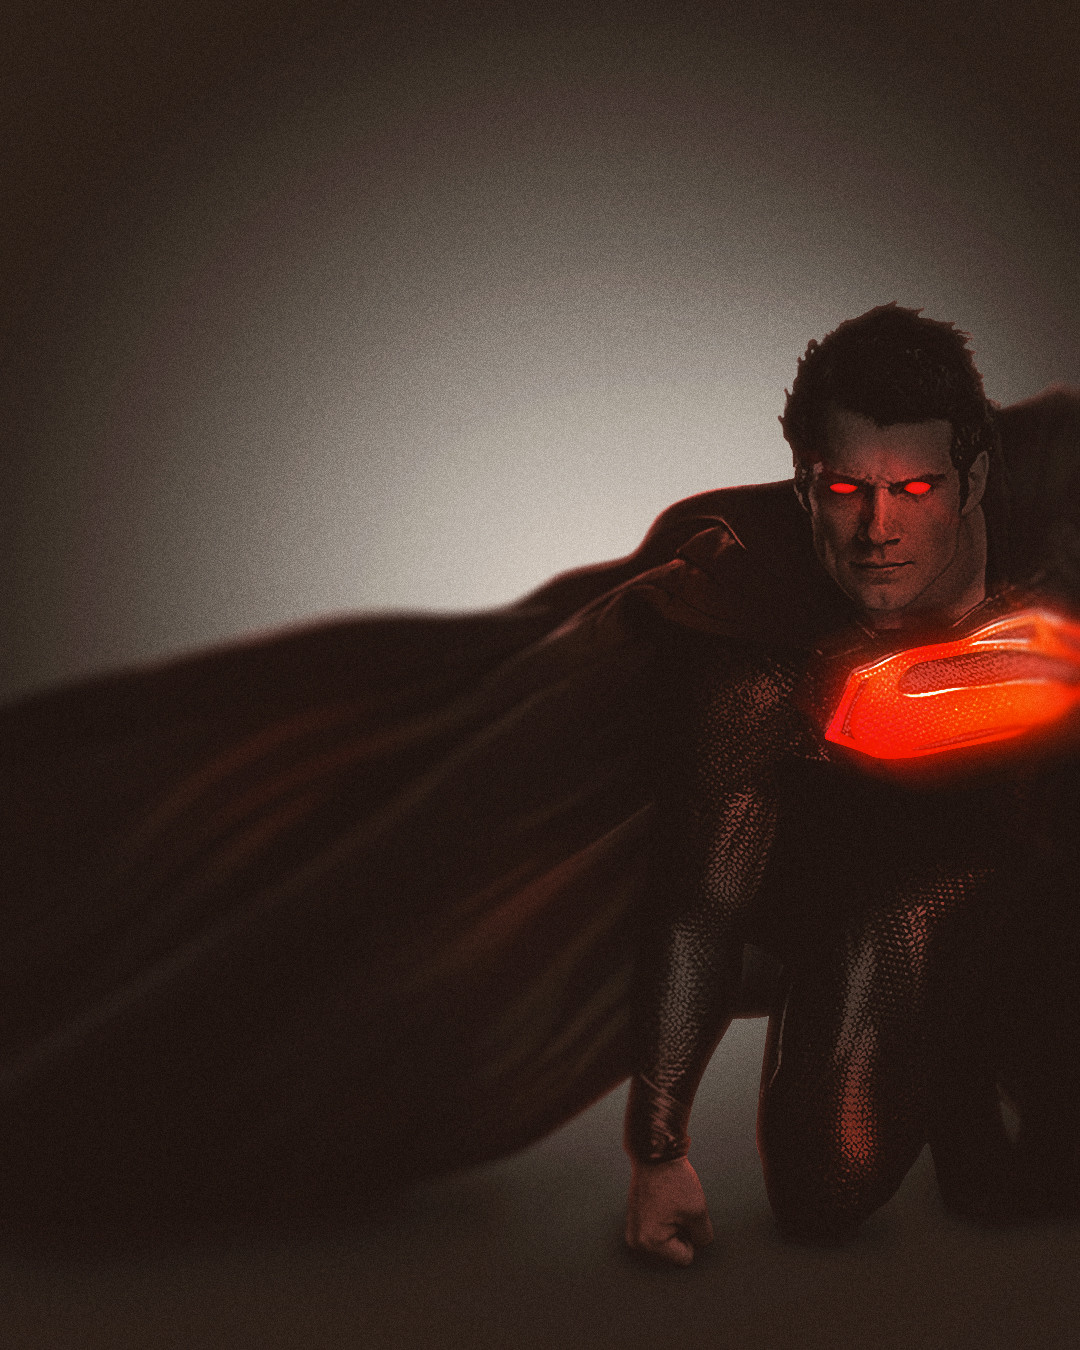 Nick tam masaolab justiceleague colorfun superman v1